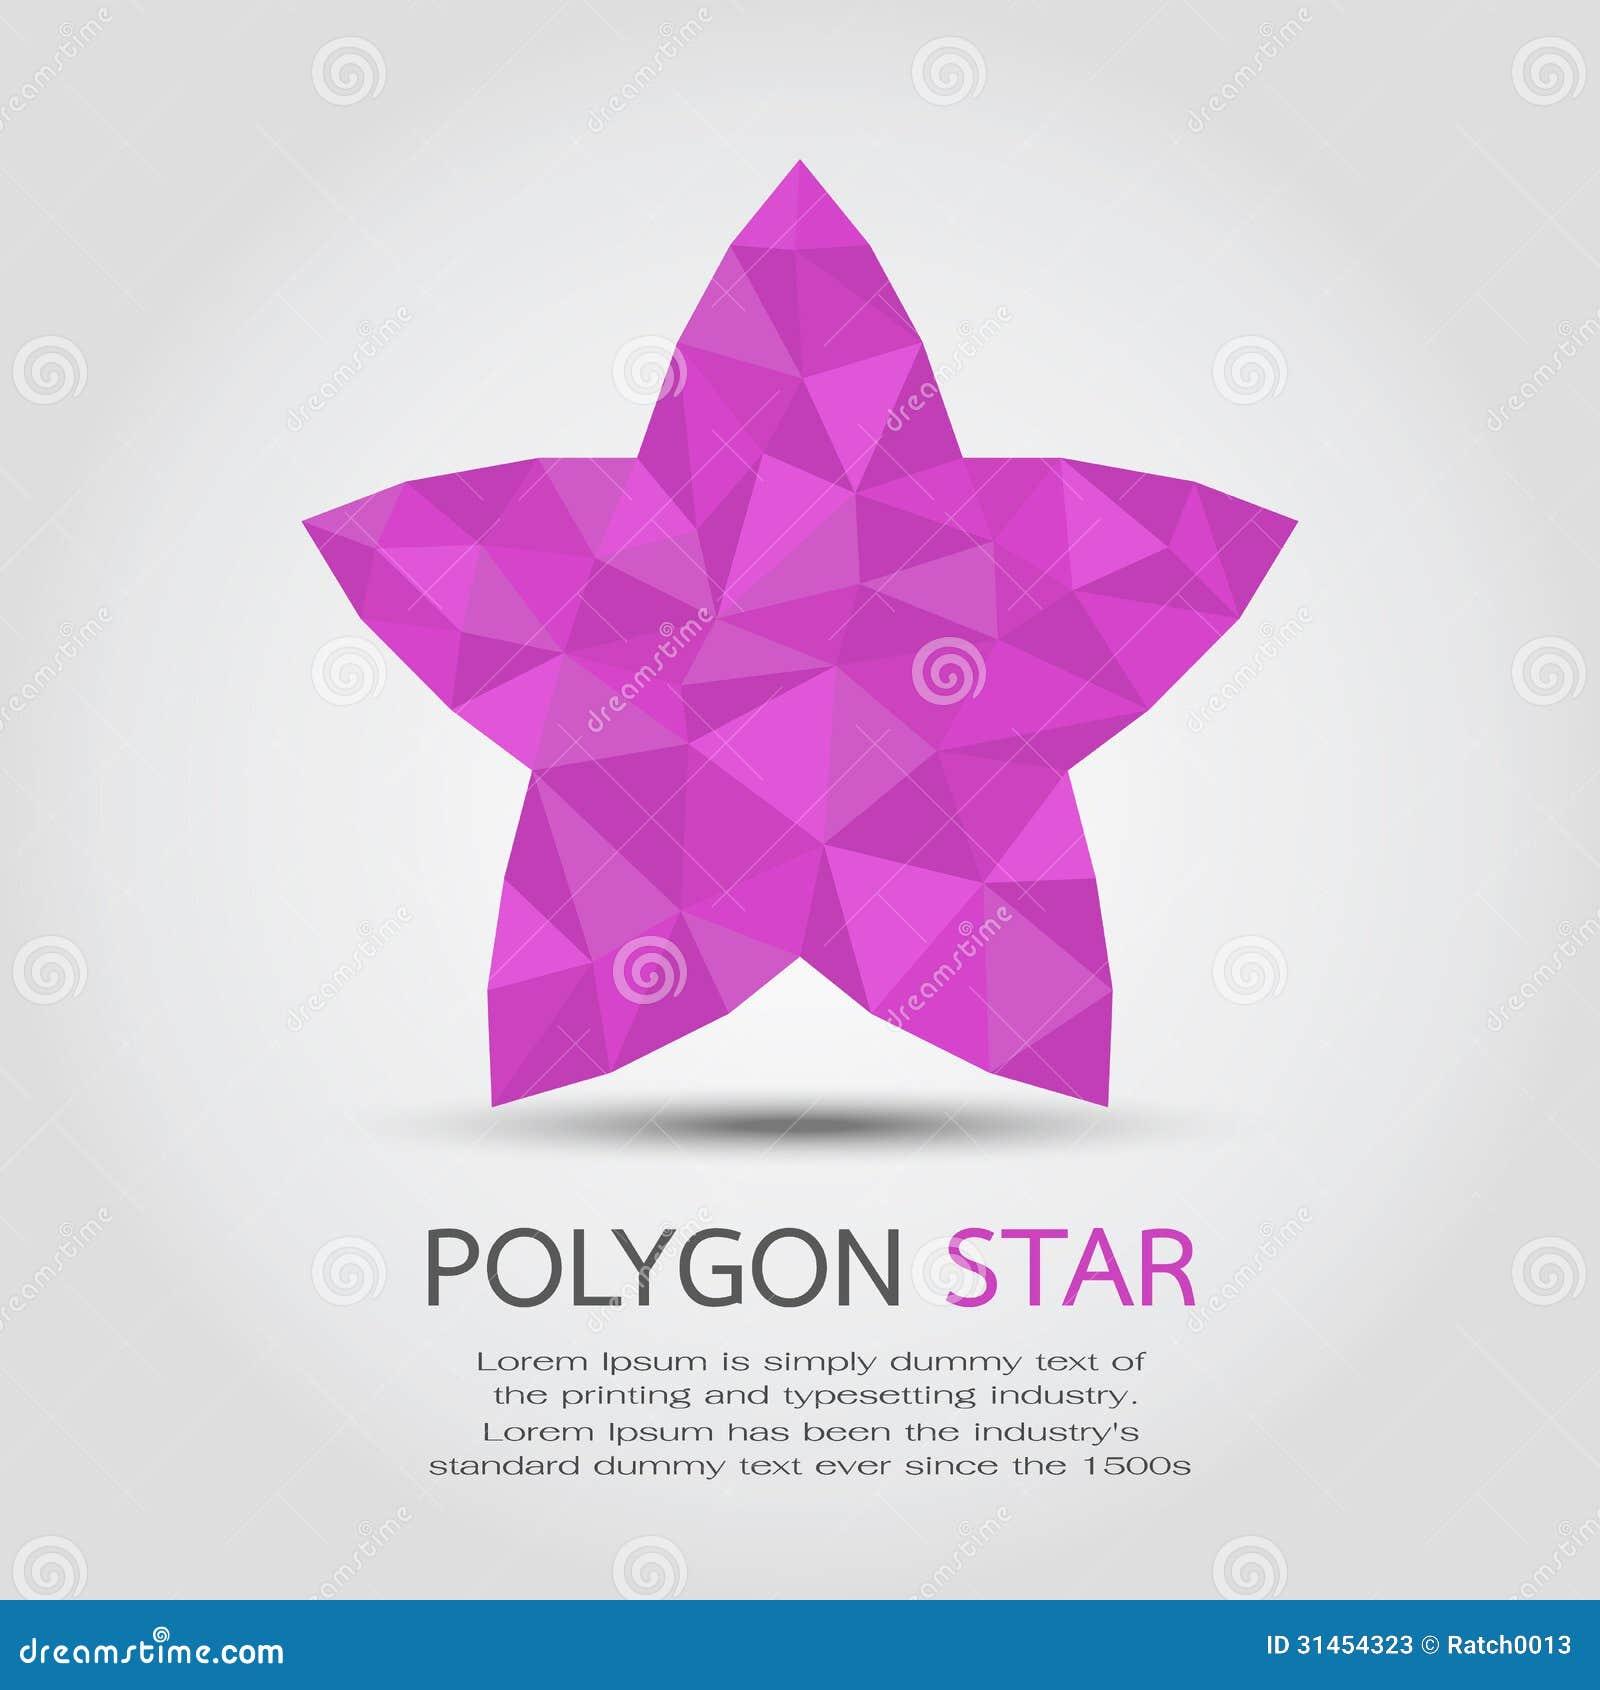 polygon star stock photos image  polygon star